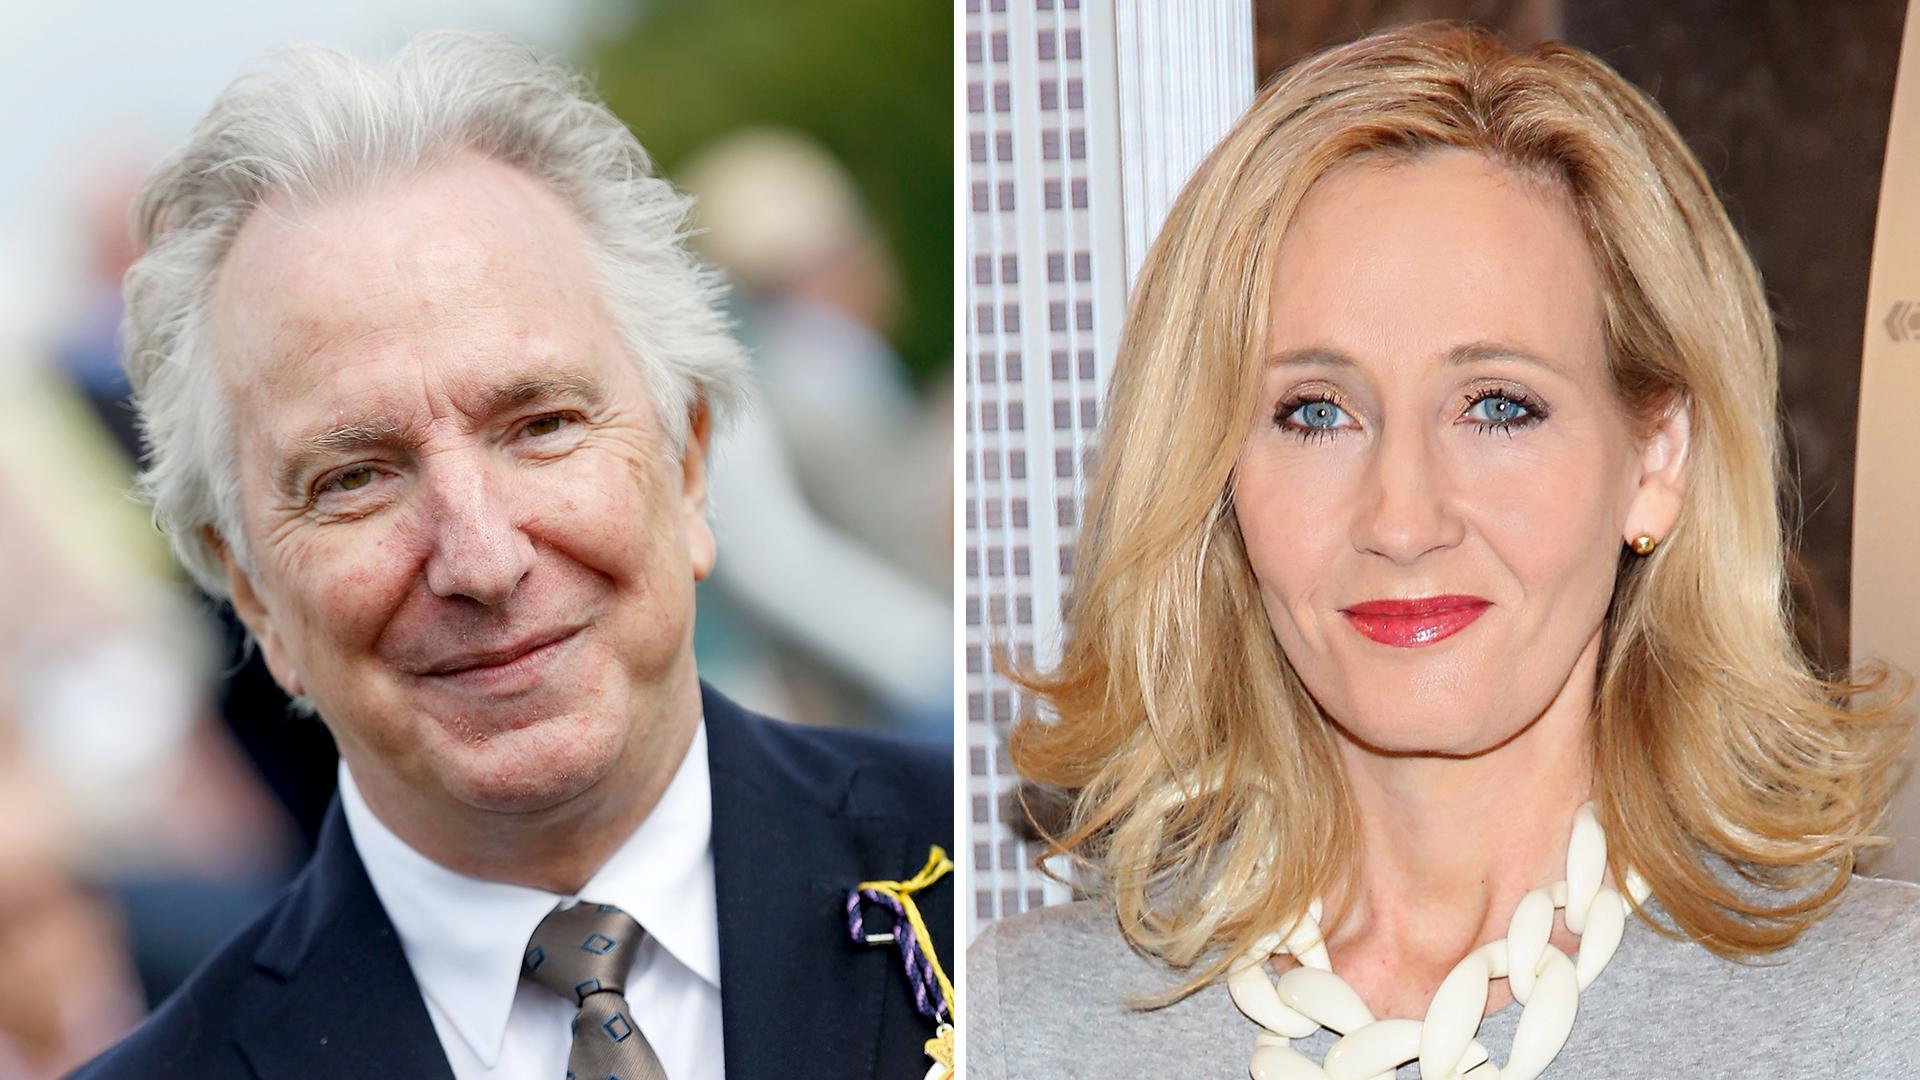 J.K. Rowling reveals the 'Harry Potter' secret she told Alan Rickman about Severus Snape